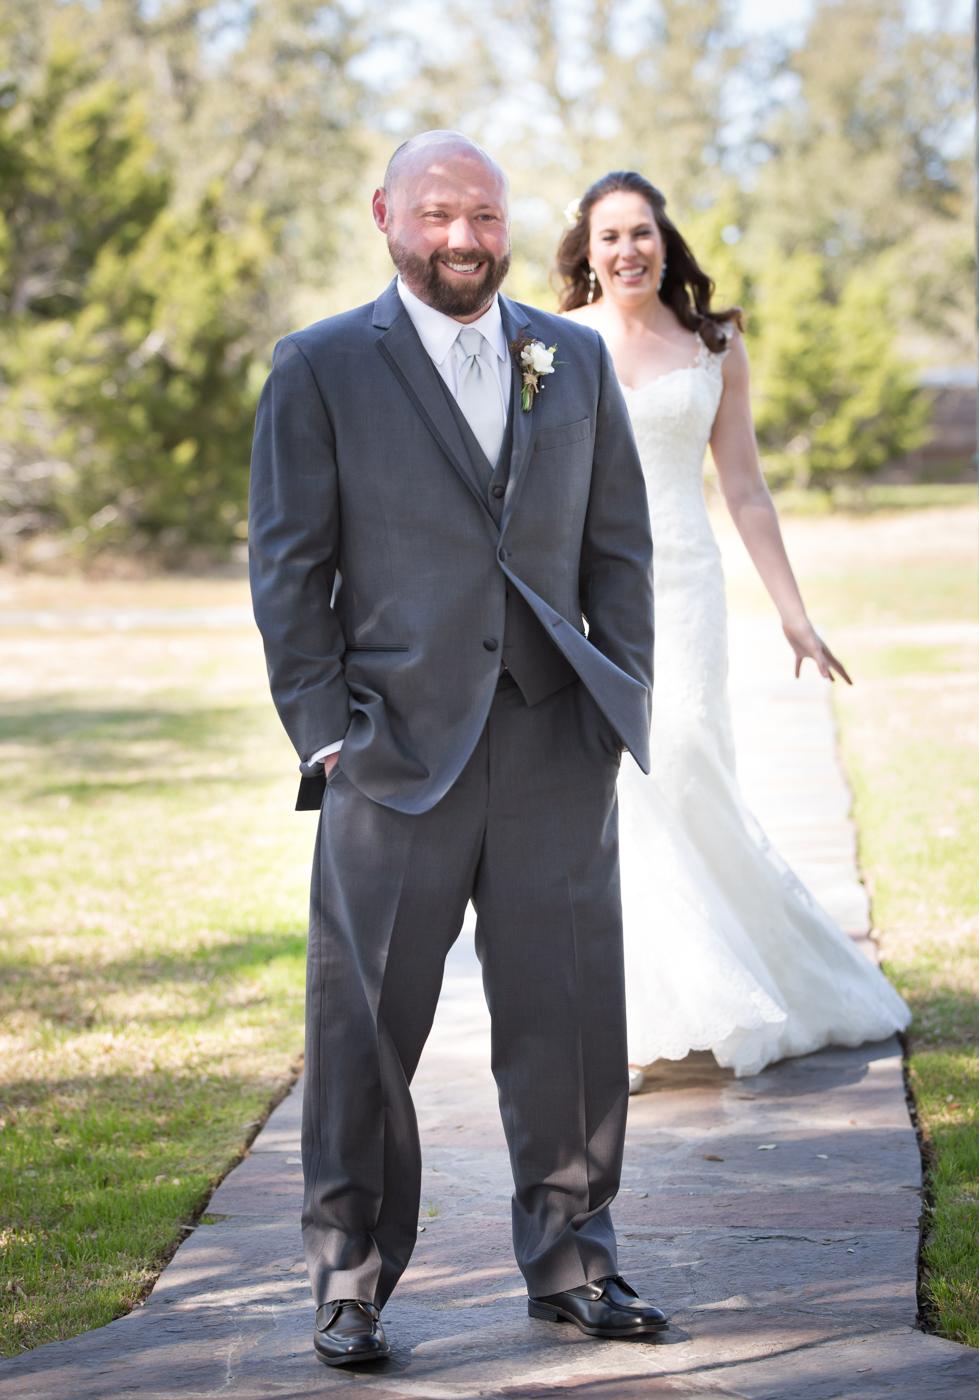 Austin-wedding-photo-and-video-009.jpg